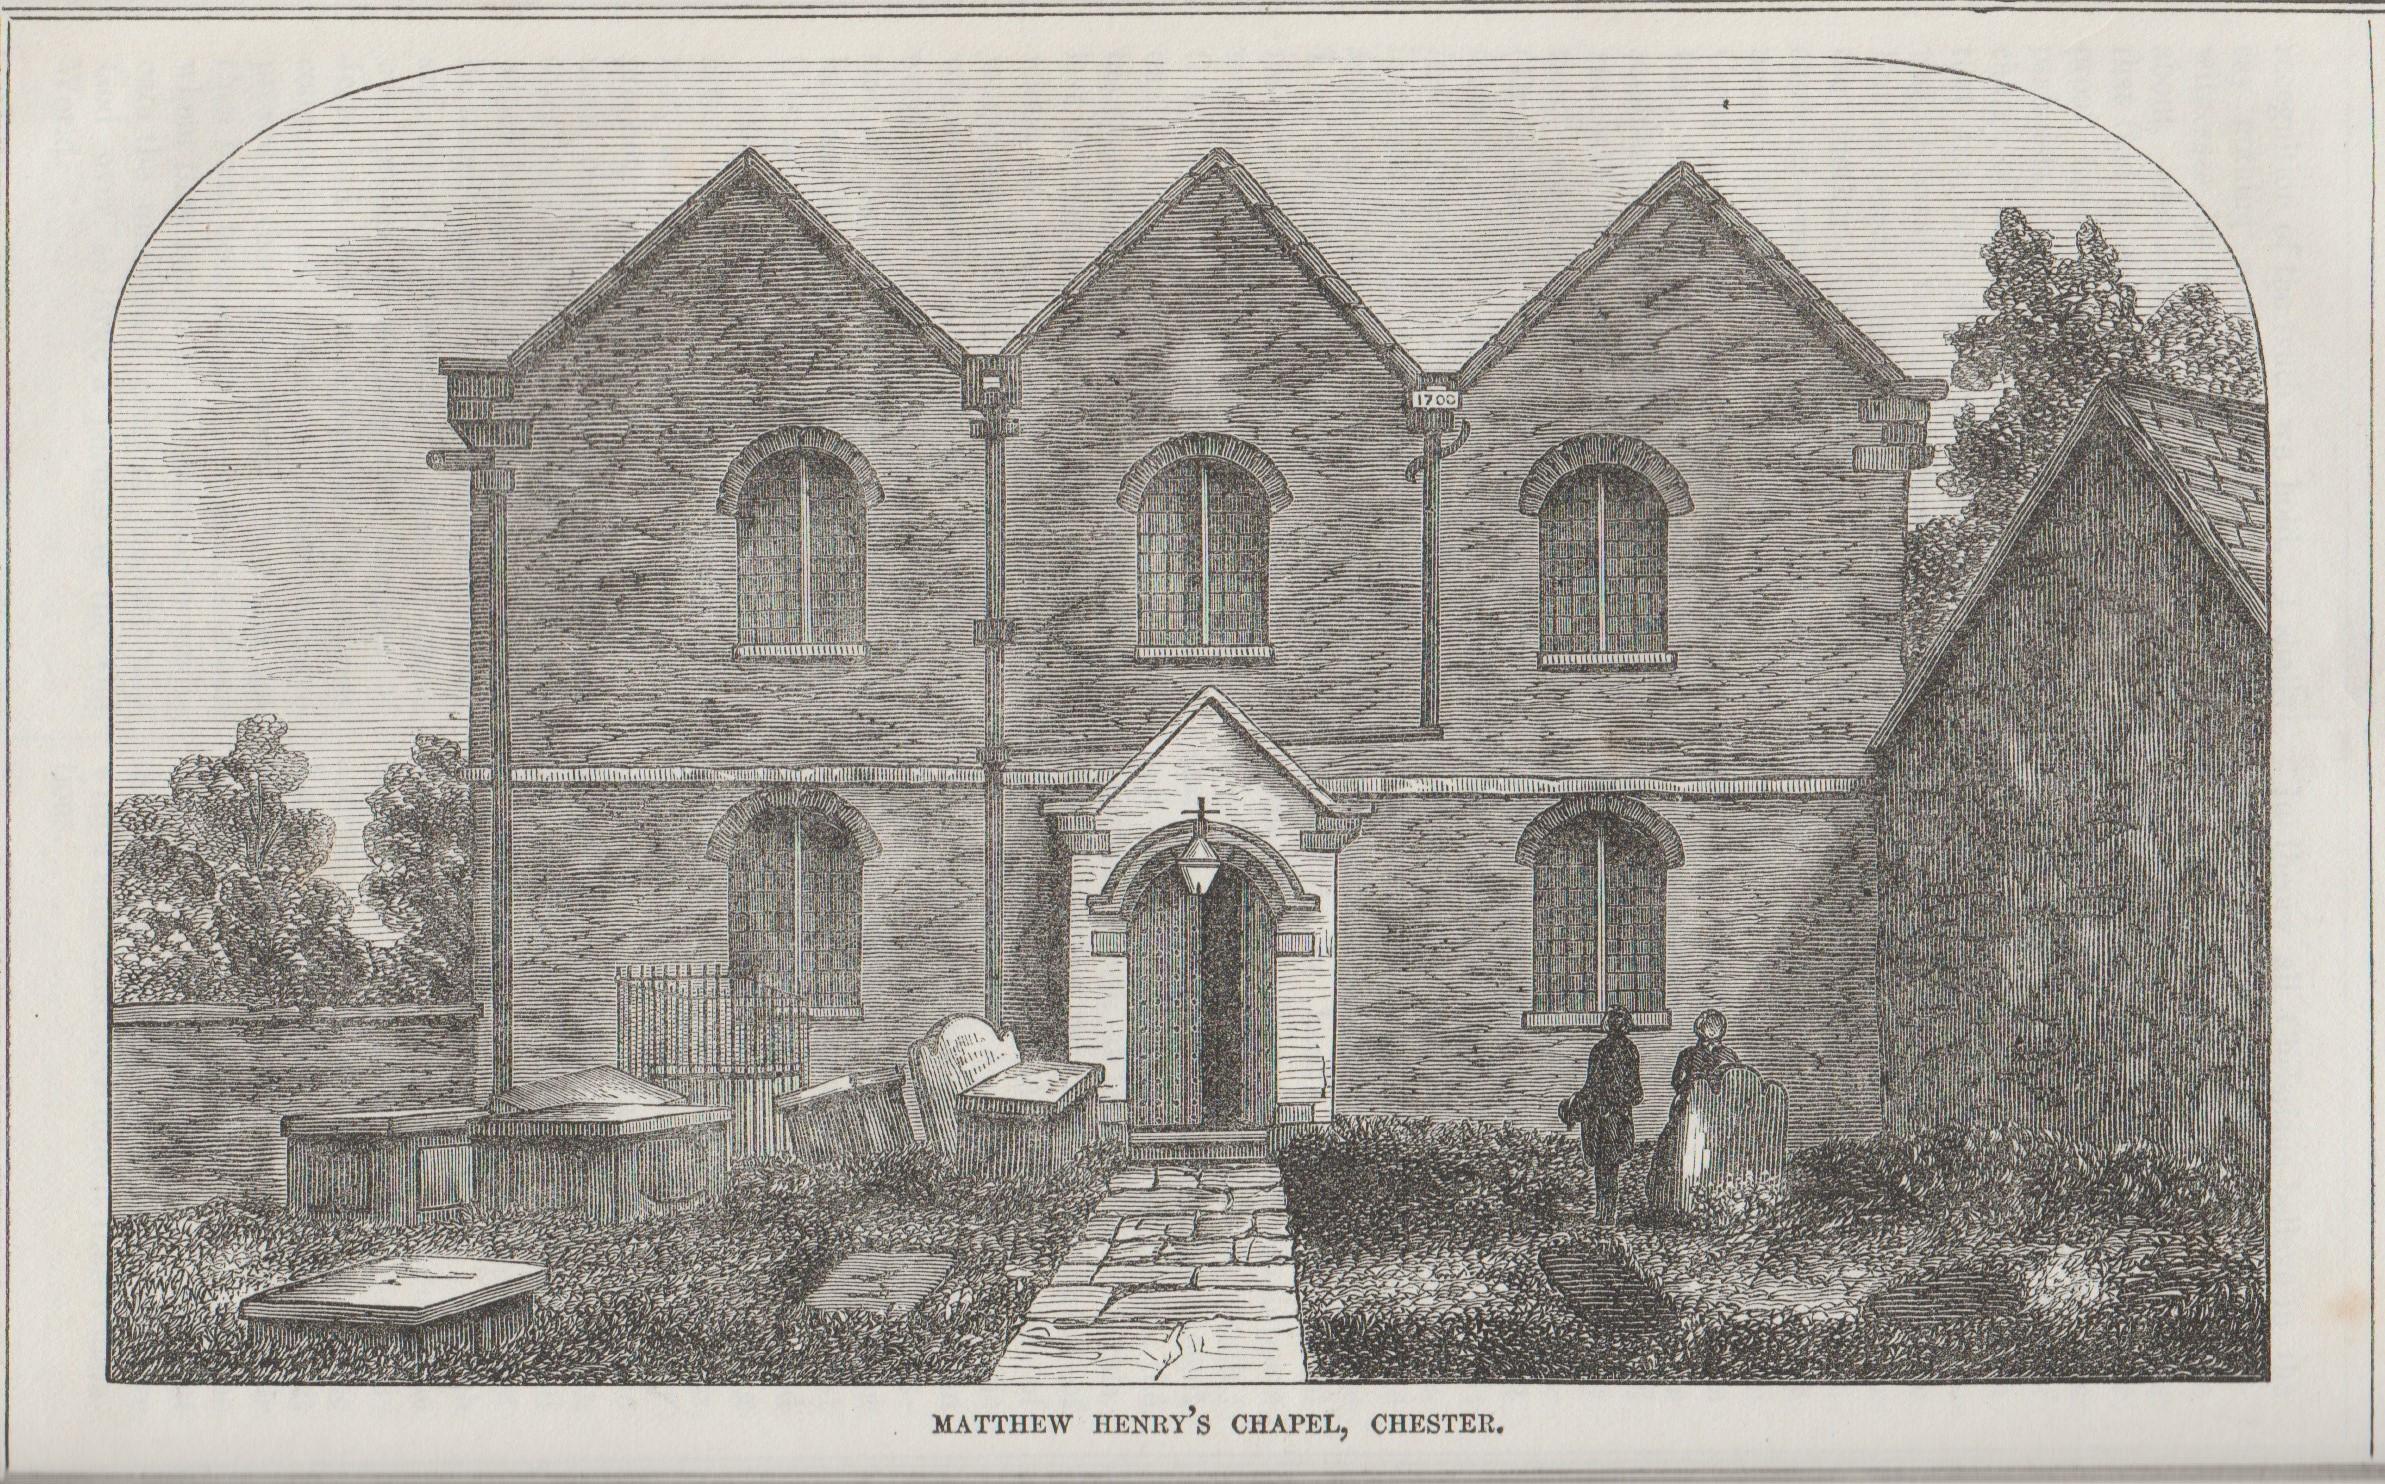 Chester Matthew Henry's Chapel Christian Freeman 1866